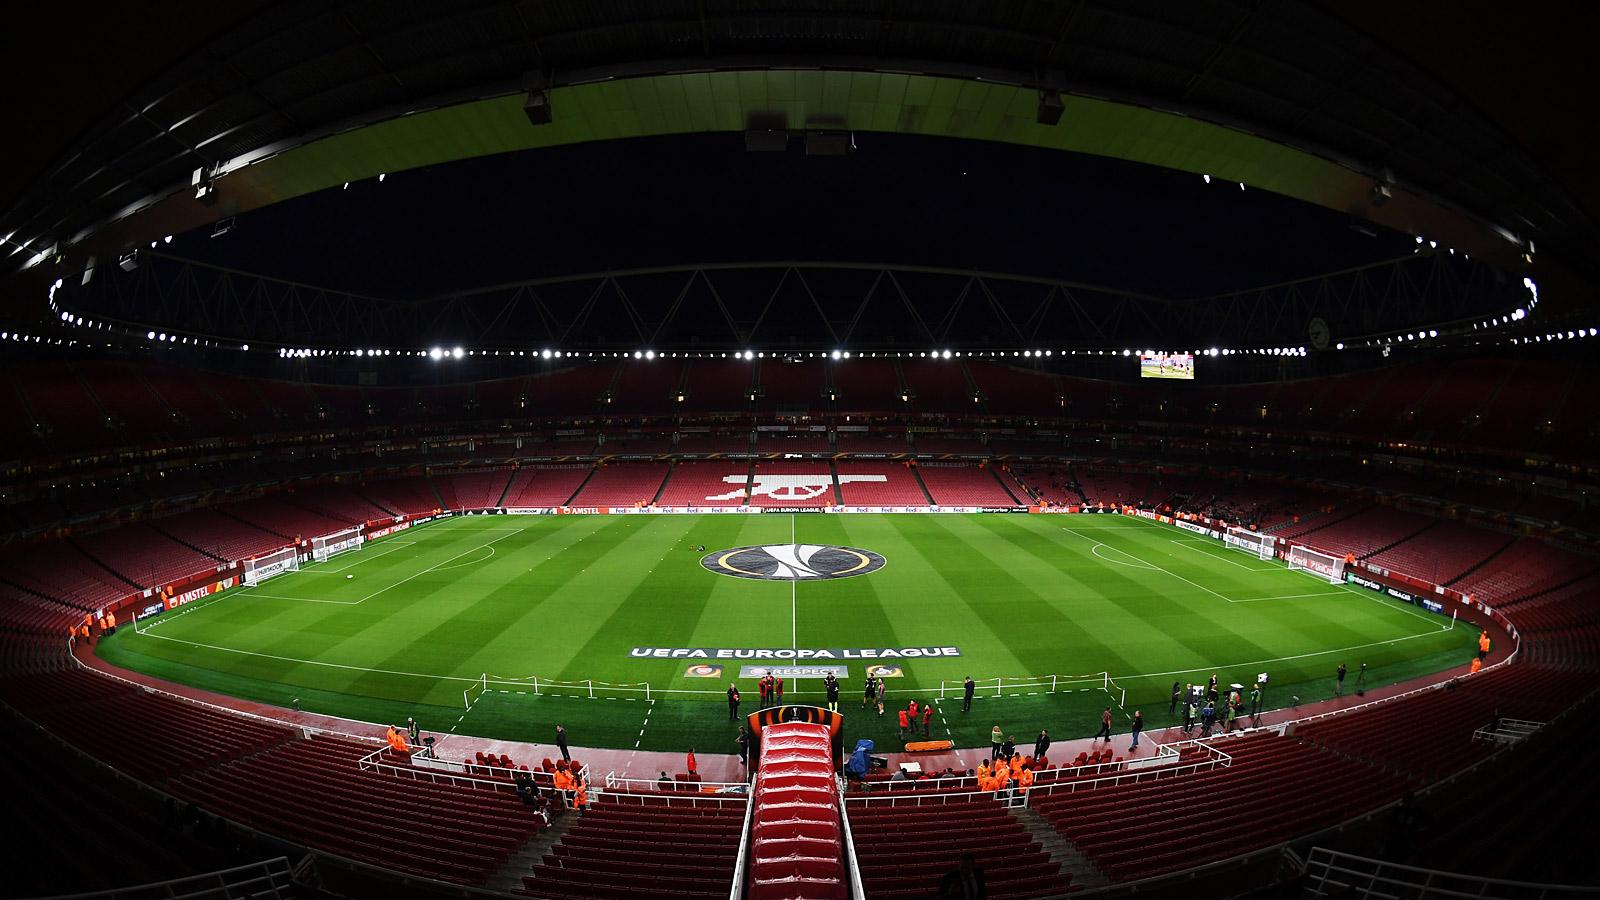 Emirates Wallpaper Hd Arsenal V Cologne Update Club Statement News